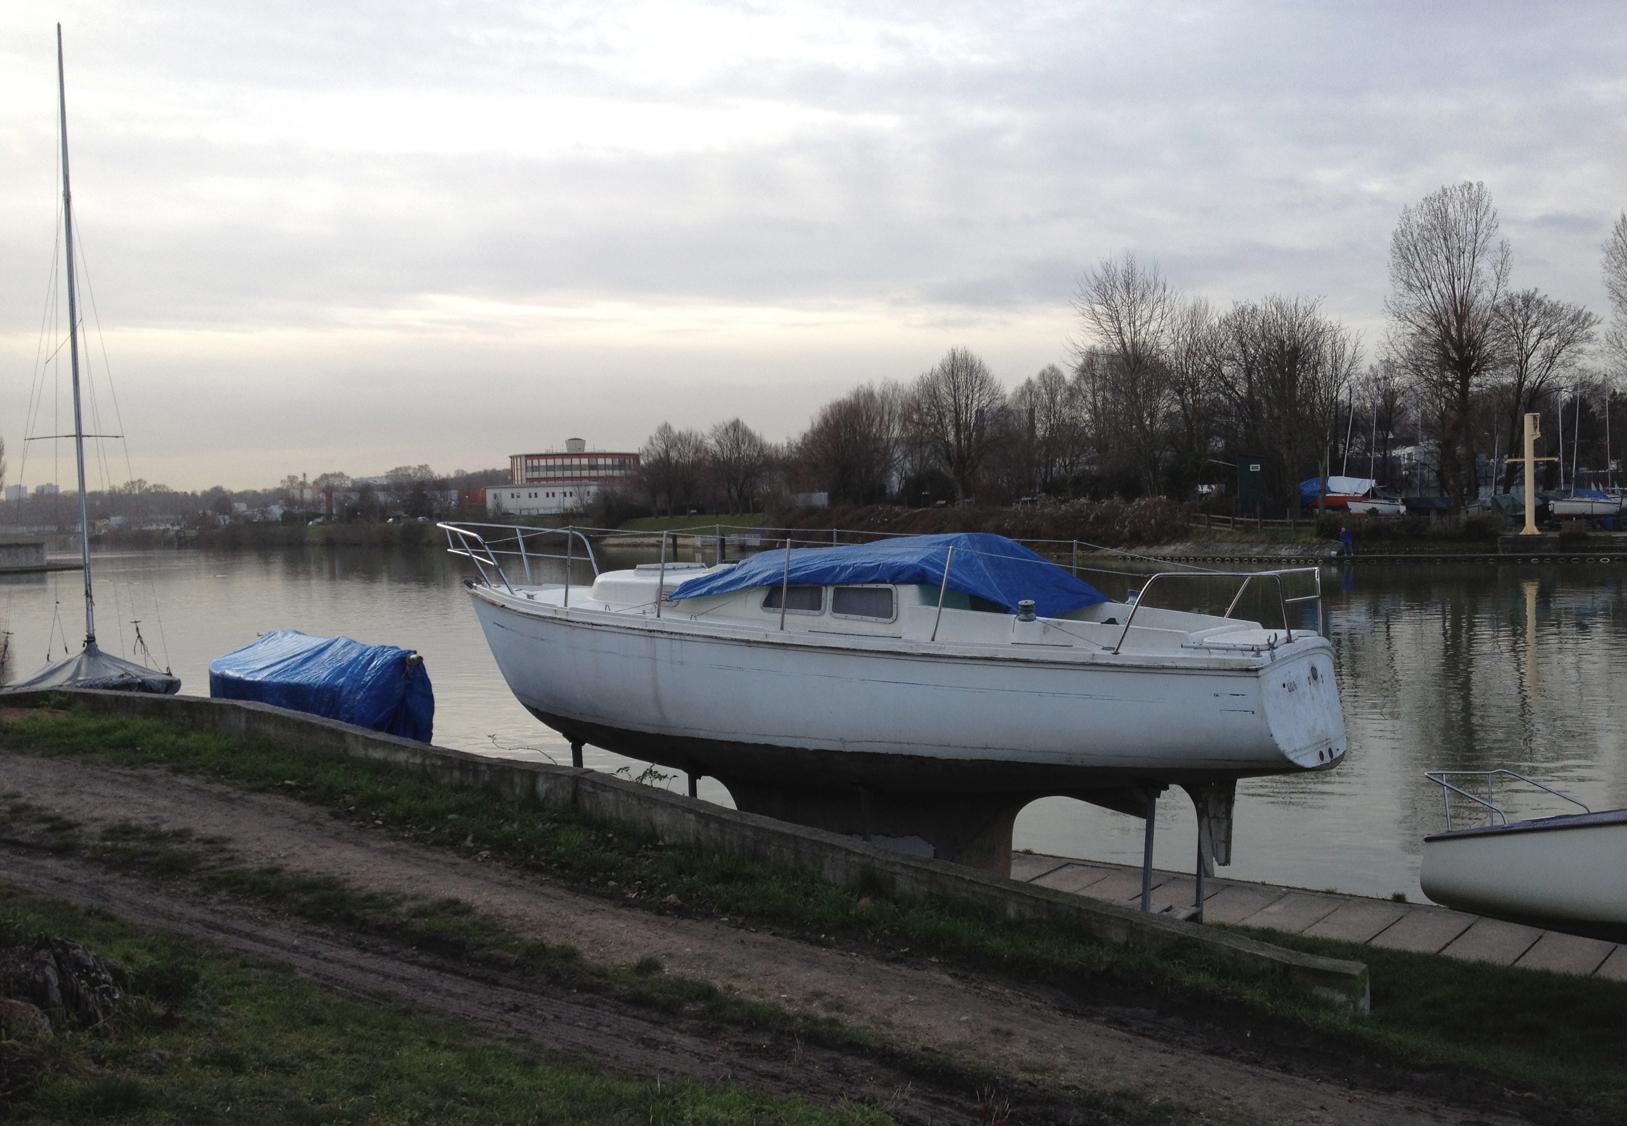 Base de voile de la vga tr s chers bateaux jf le helloco - Amenagement cheminee condamnee ...